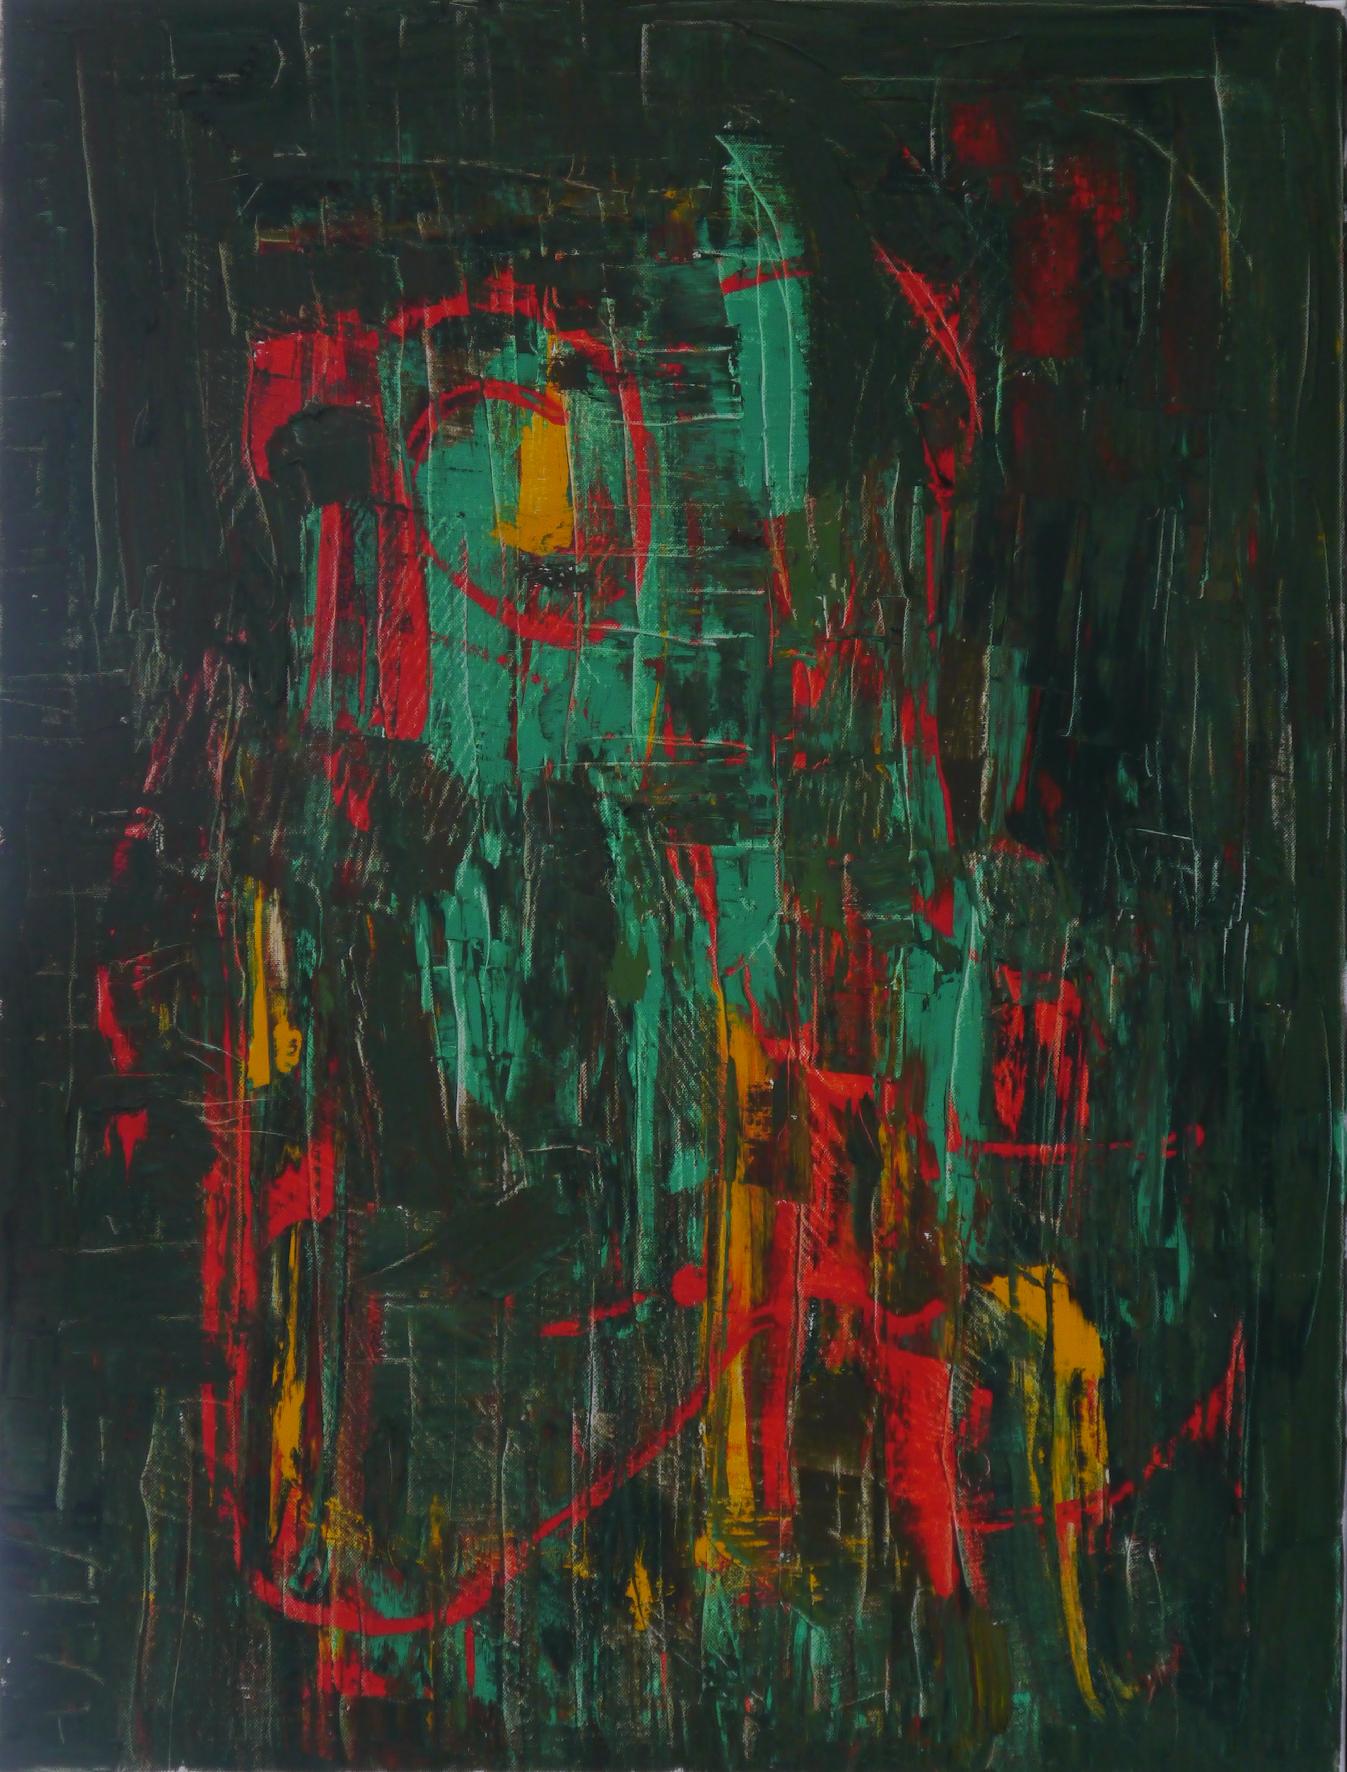 Painting_oils_50_70cm_NoTitle_Marta Wapiennik_2016.jpg